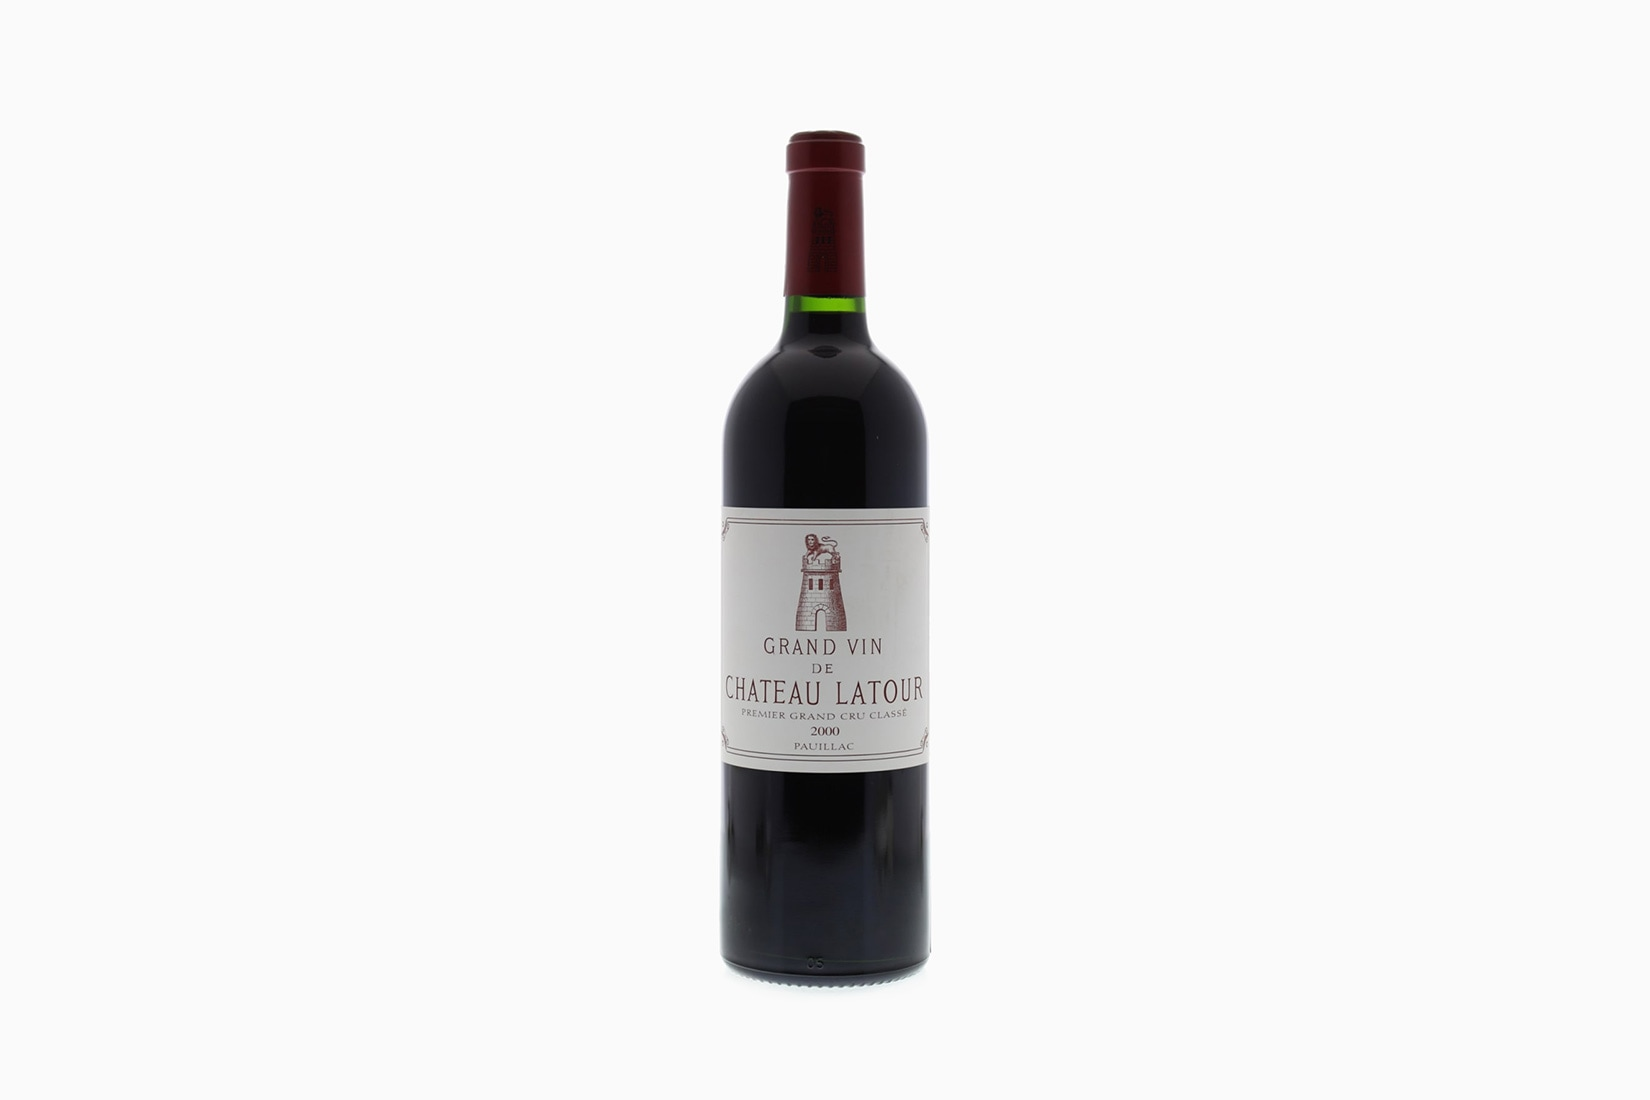 best wine chateau latour - Luxe Digital